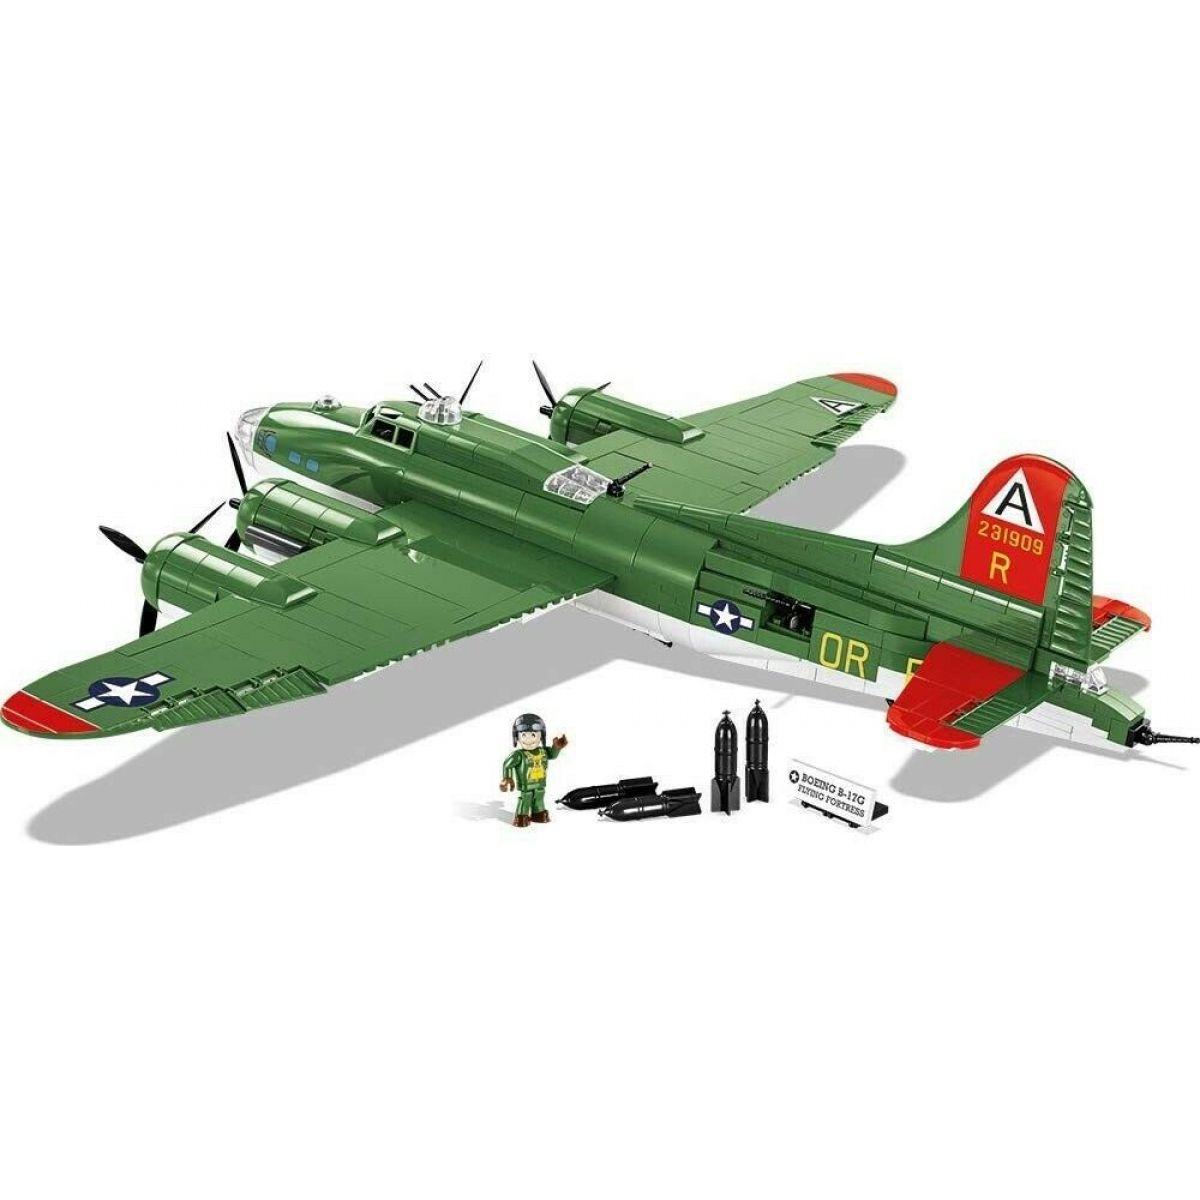 Cobi 5703 Malá armáda II. svetová vojna B-17 Flying Fortress